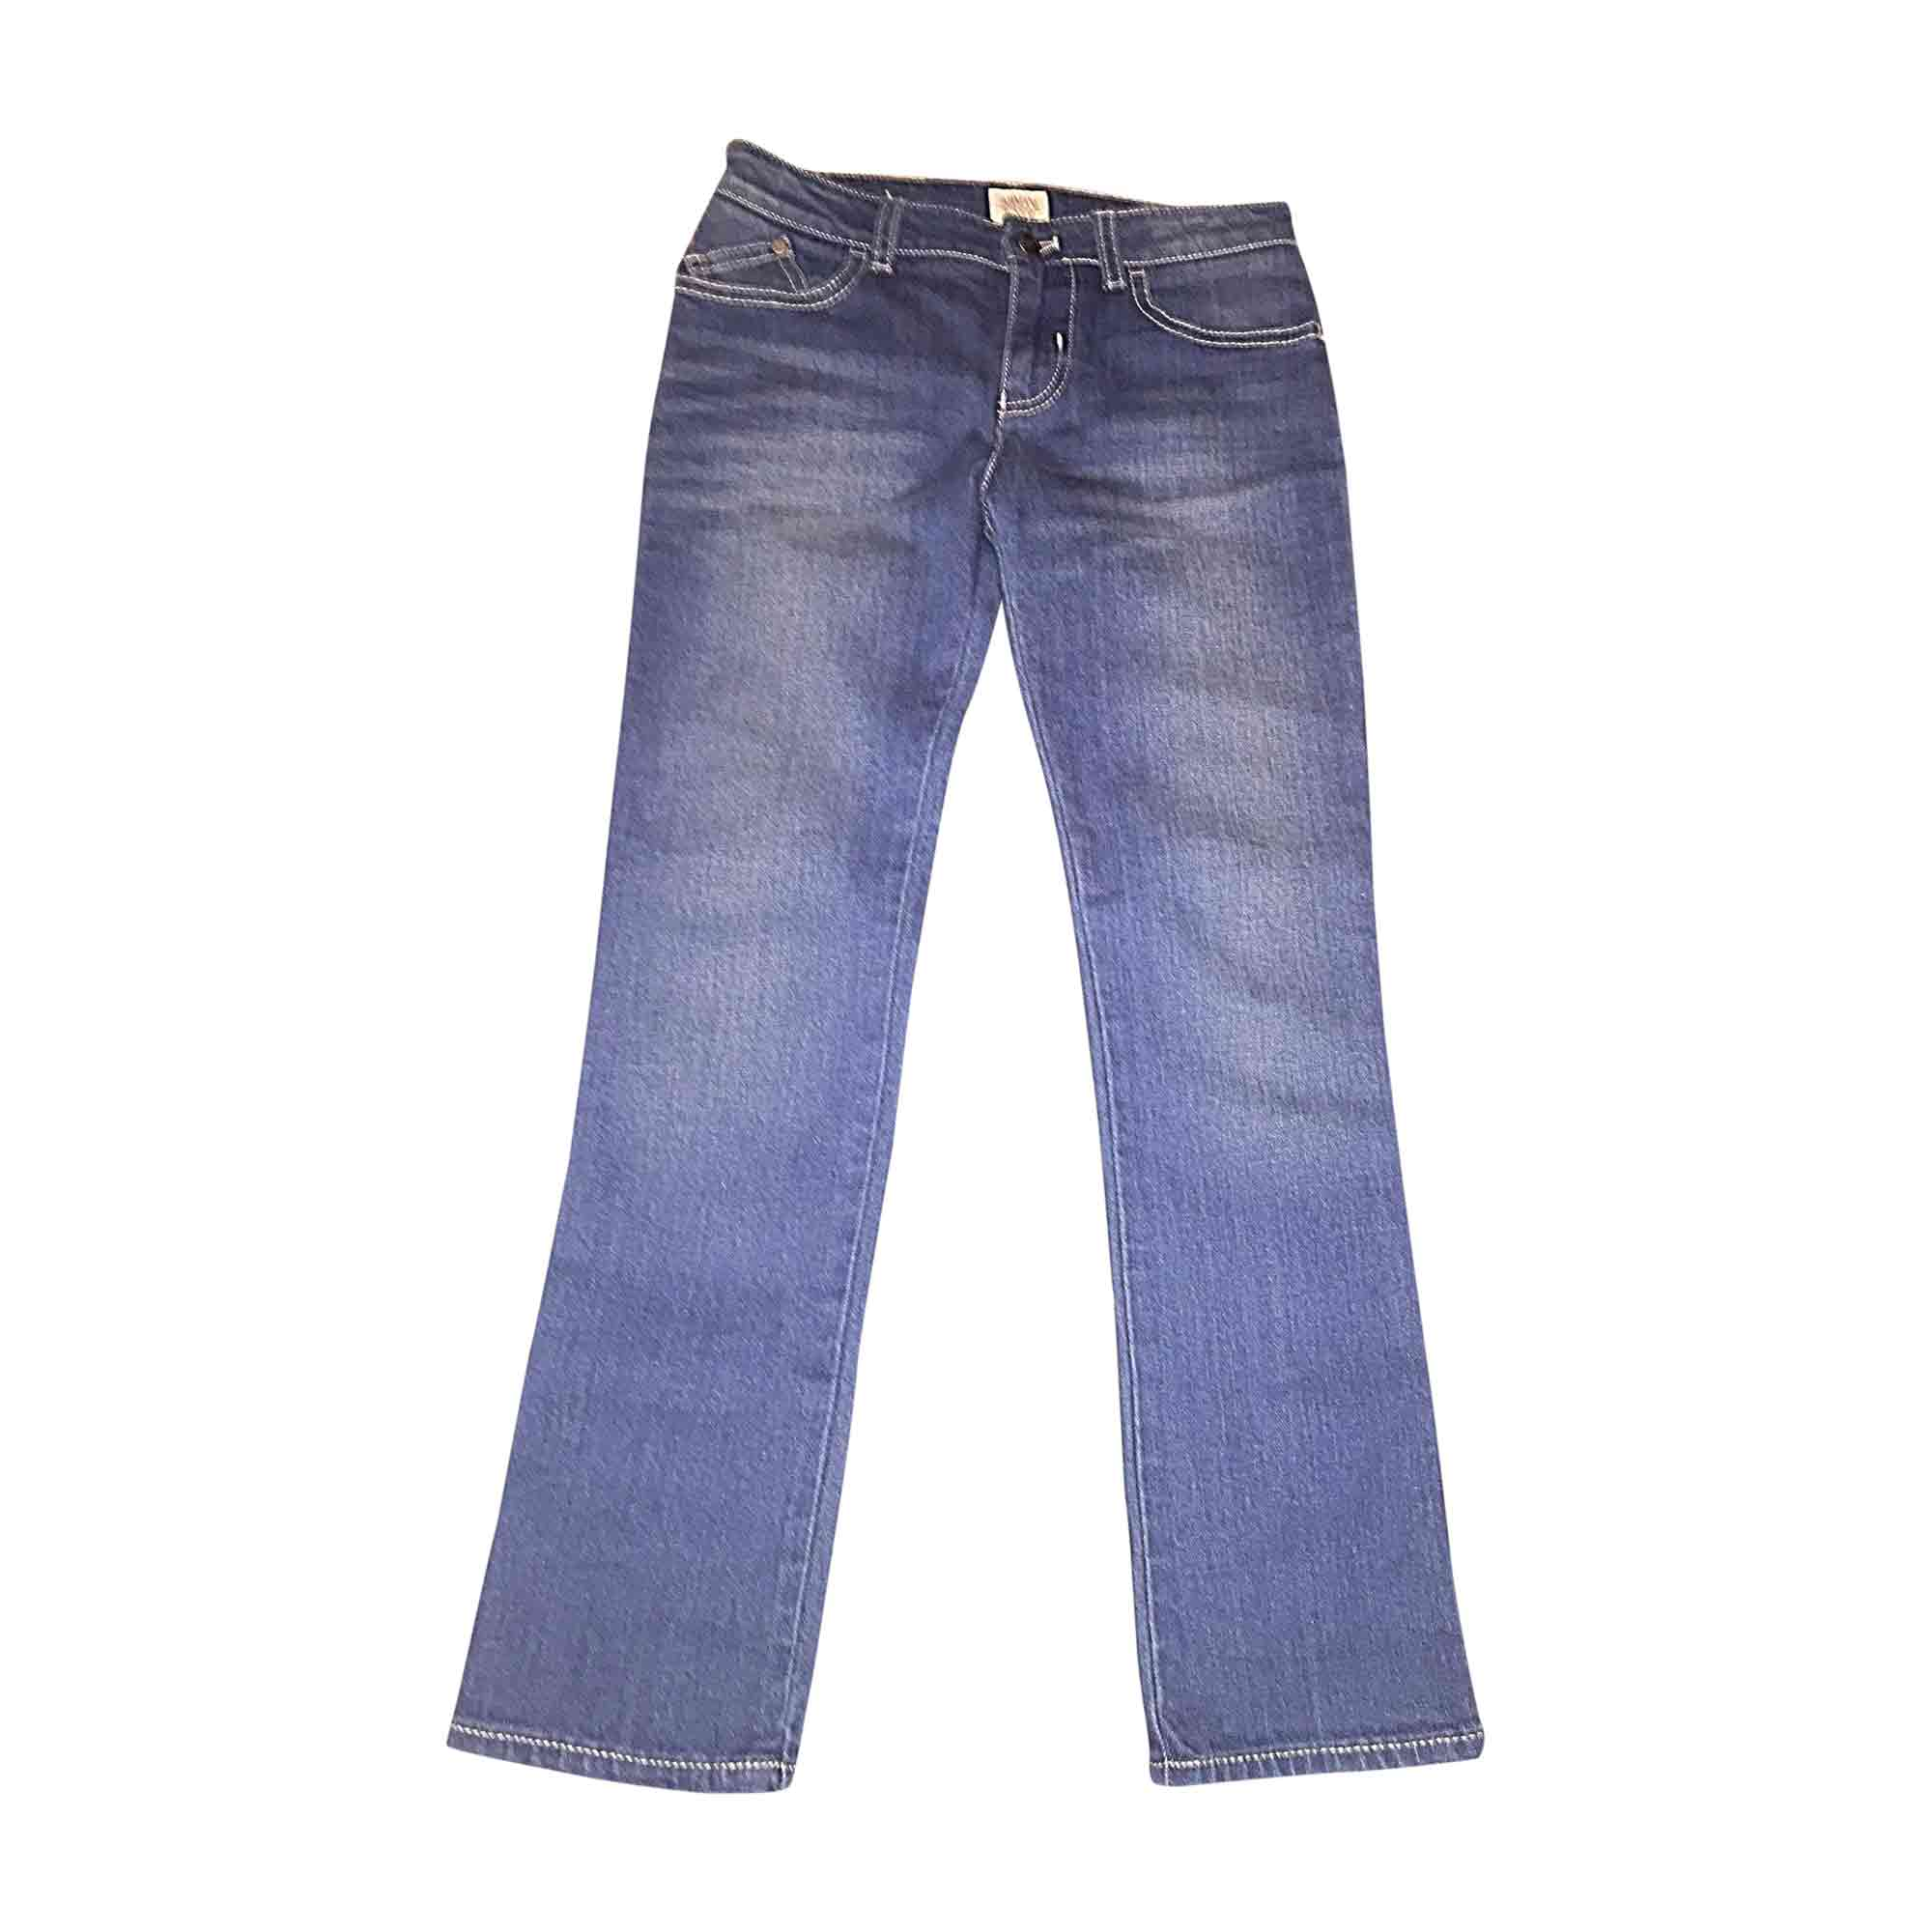 Pants ARMANI Blue, navy, turquoise